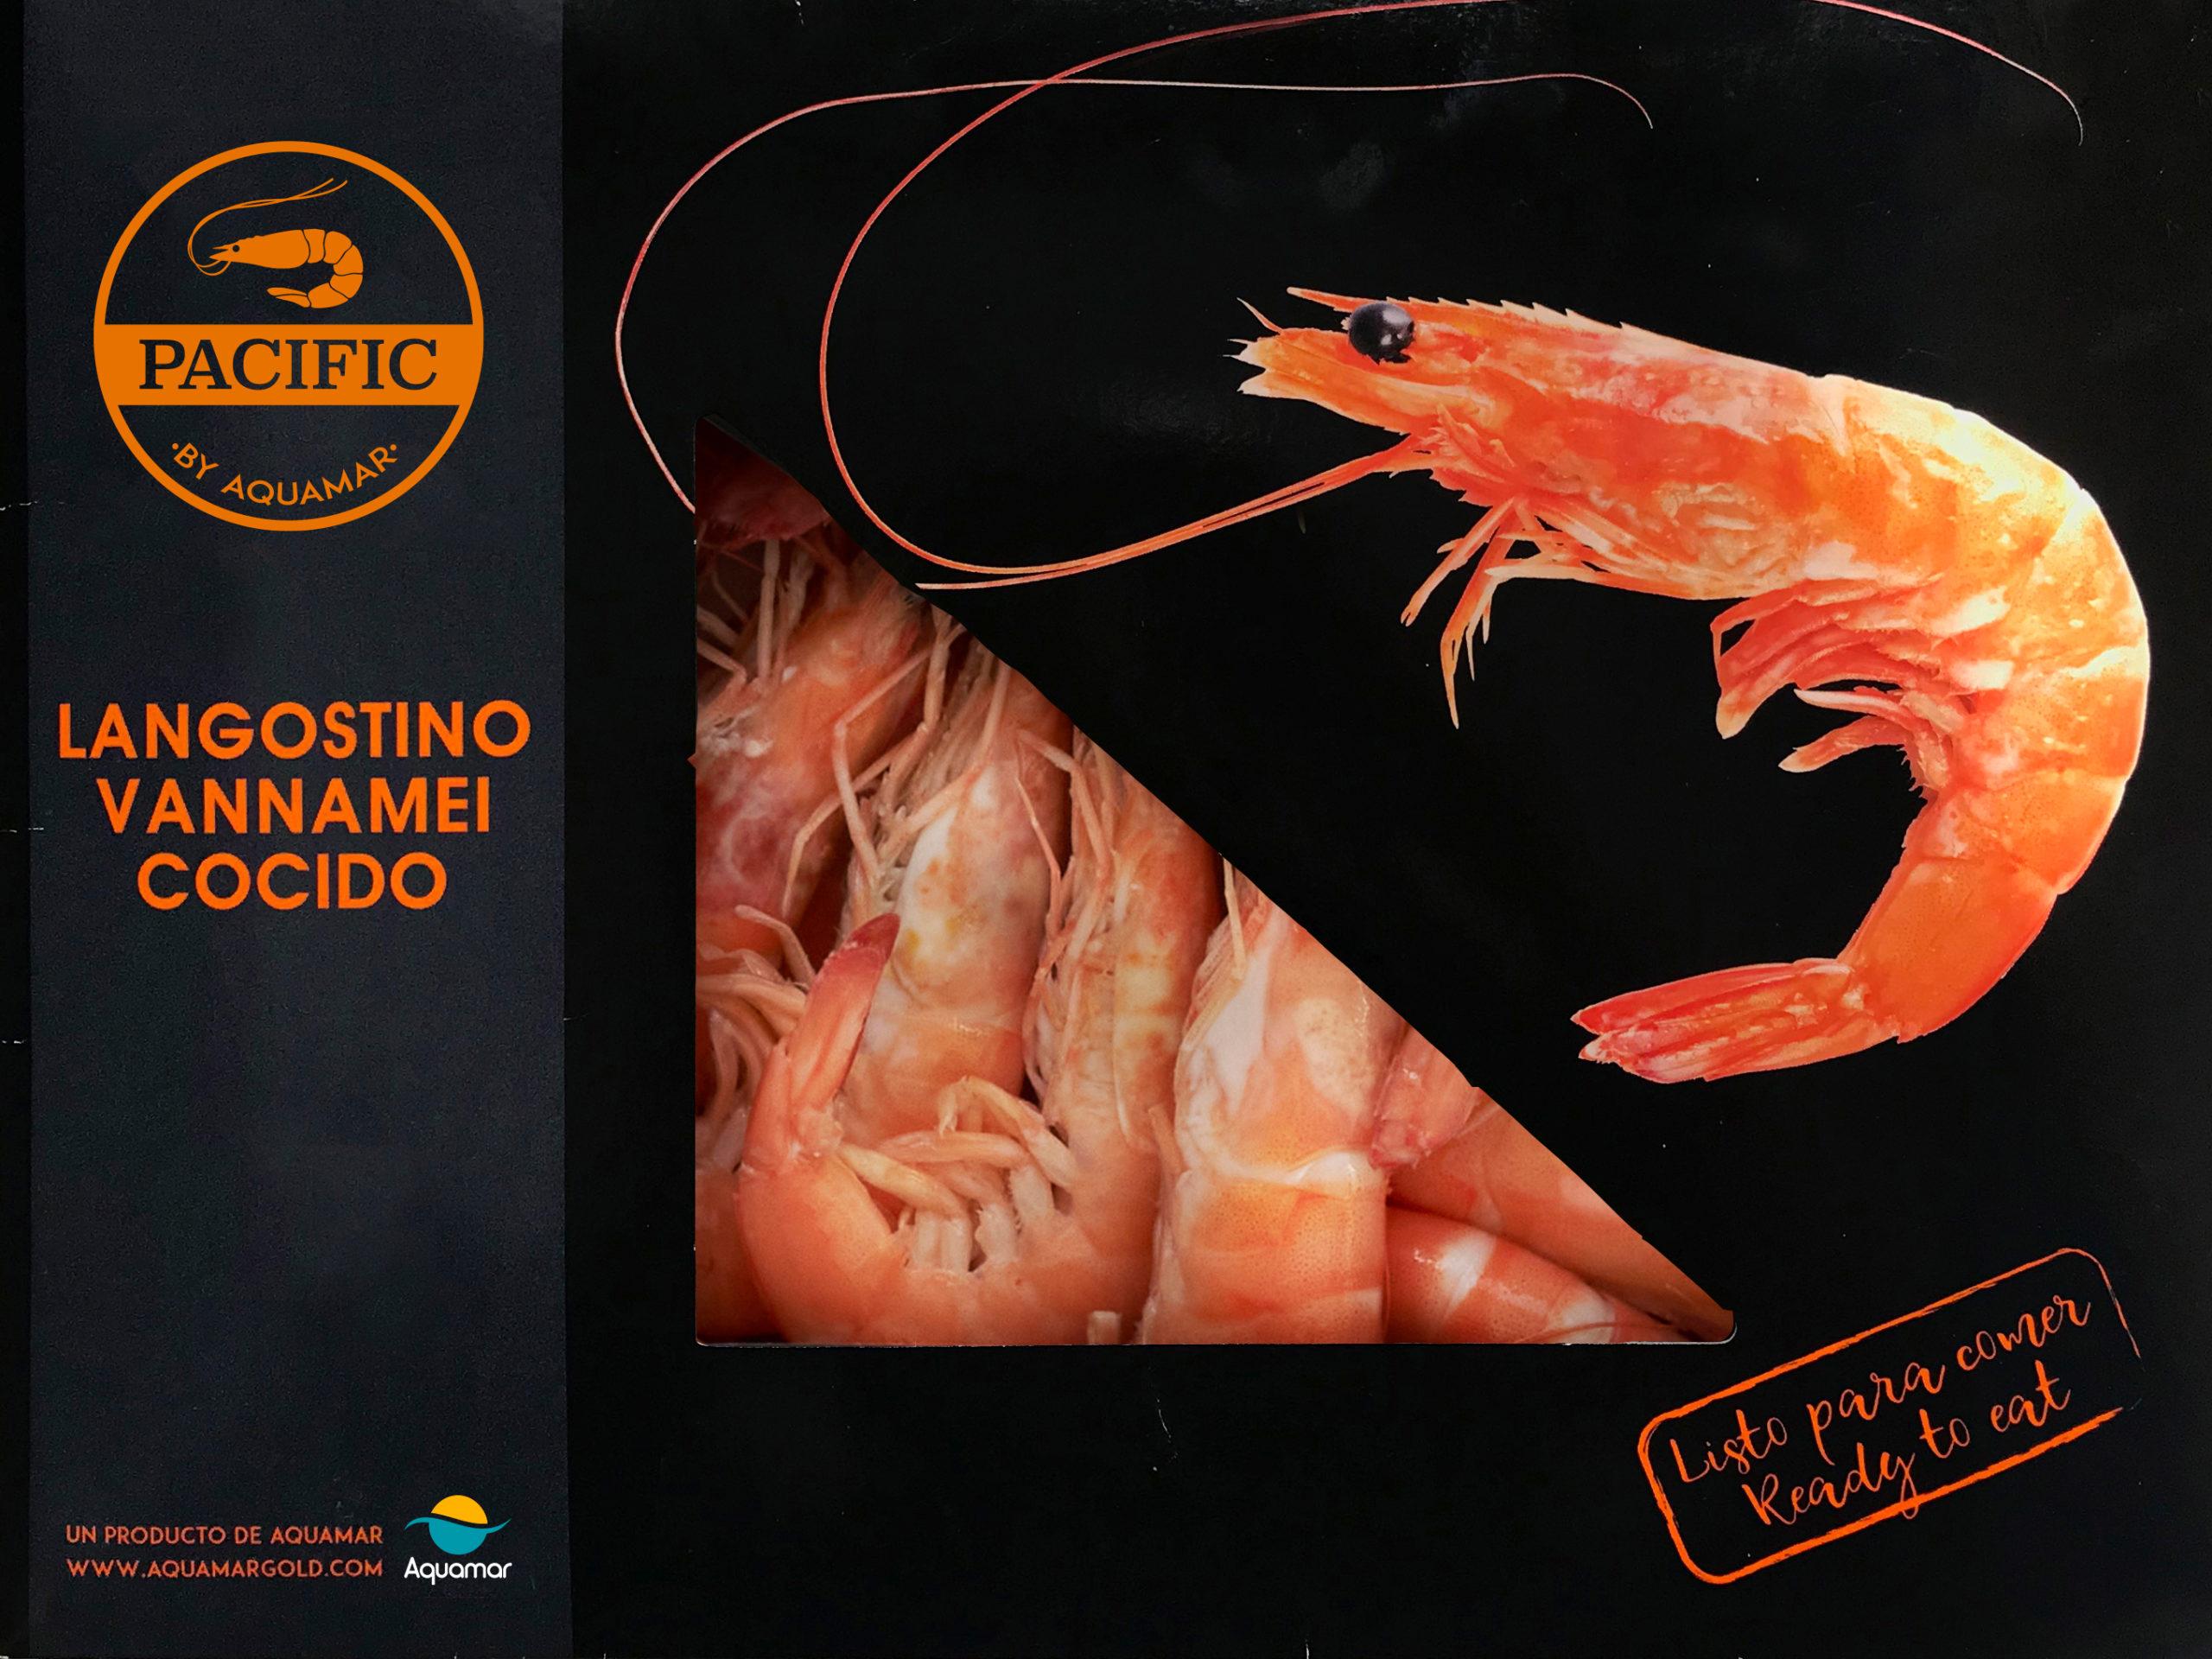 Langostino vannamei Cocido PREMIUM 0% glaseo PACIFIC by Aquamar 2kg